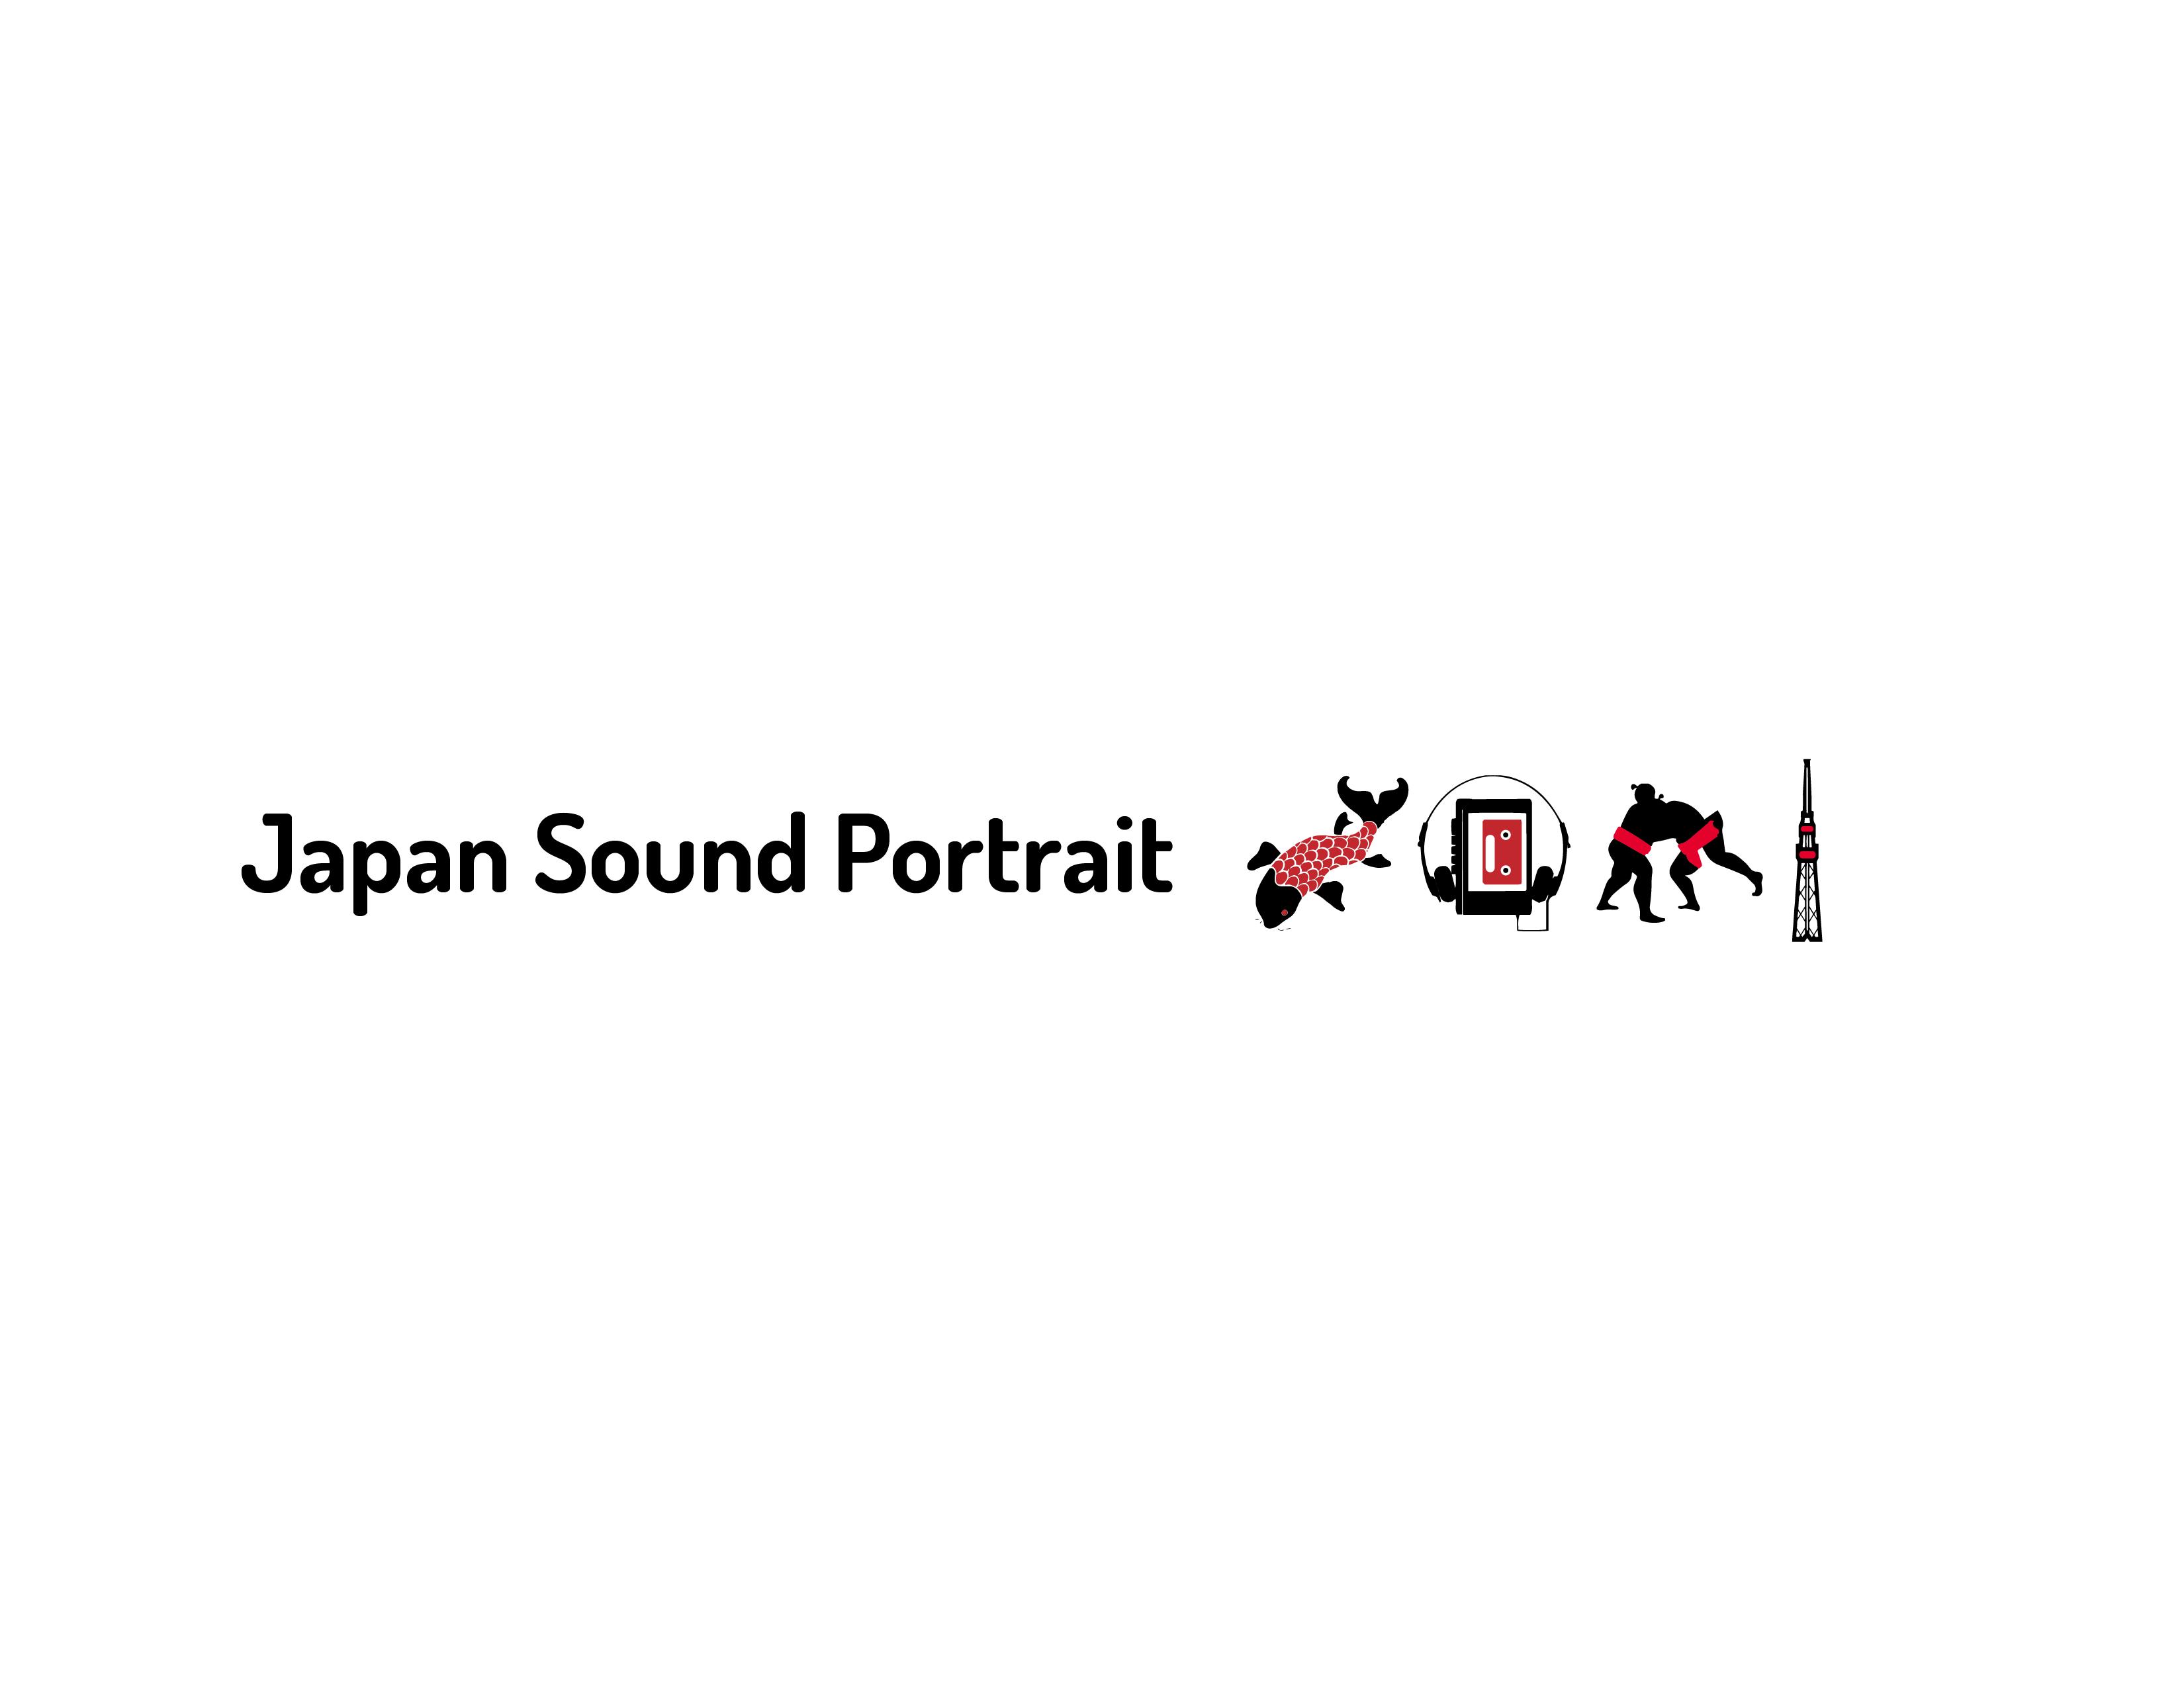 Japan Sound Portrait at Cafe Oto : MAKOTO NOMURA + KUMIKO YABU + MIDORI KOMACHI + ABIRDWHALE + VERITY LANE